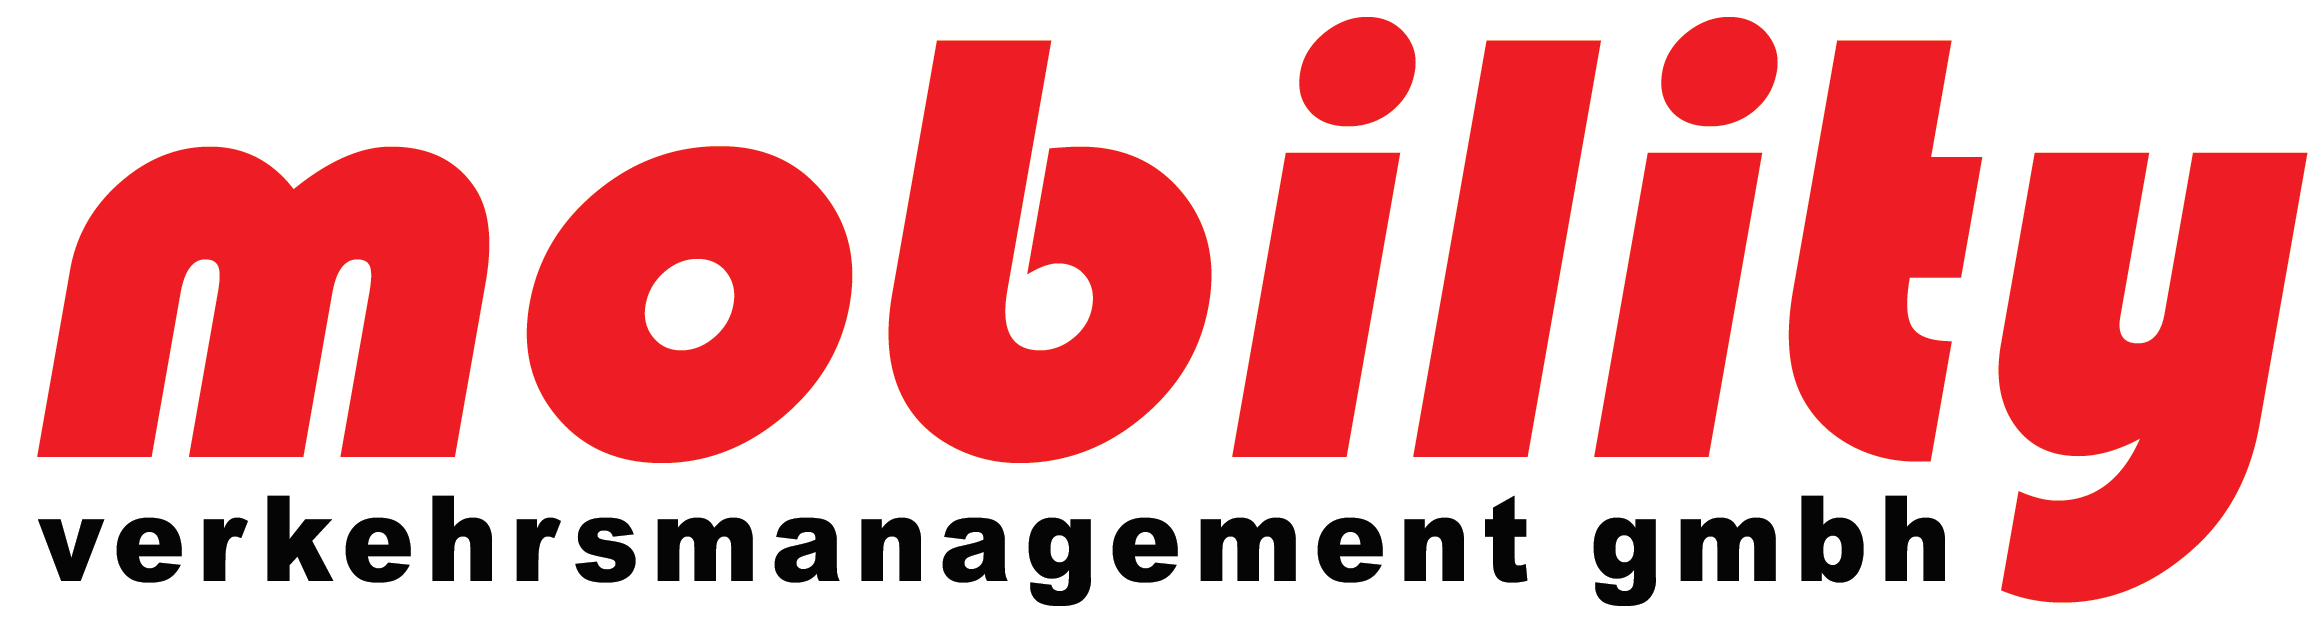 mobility verkehrsmanagement GmbH